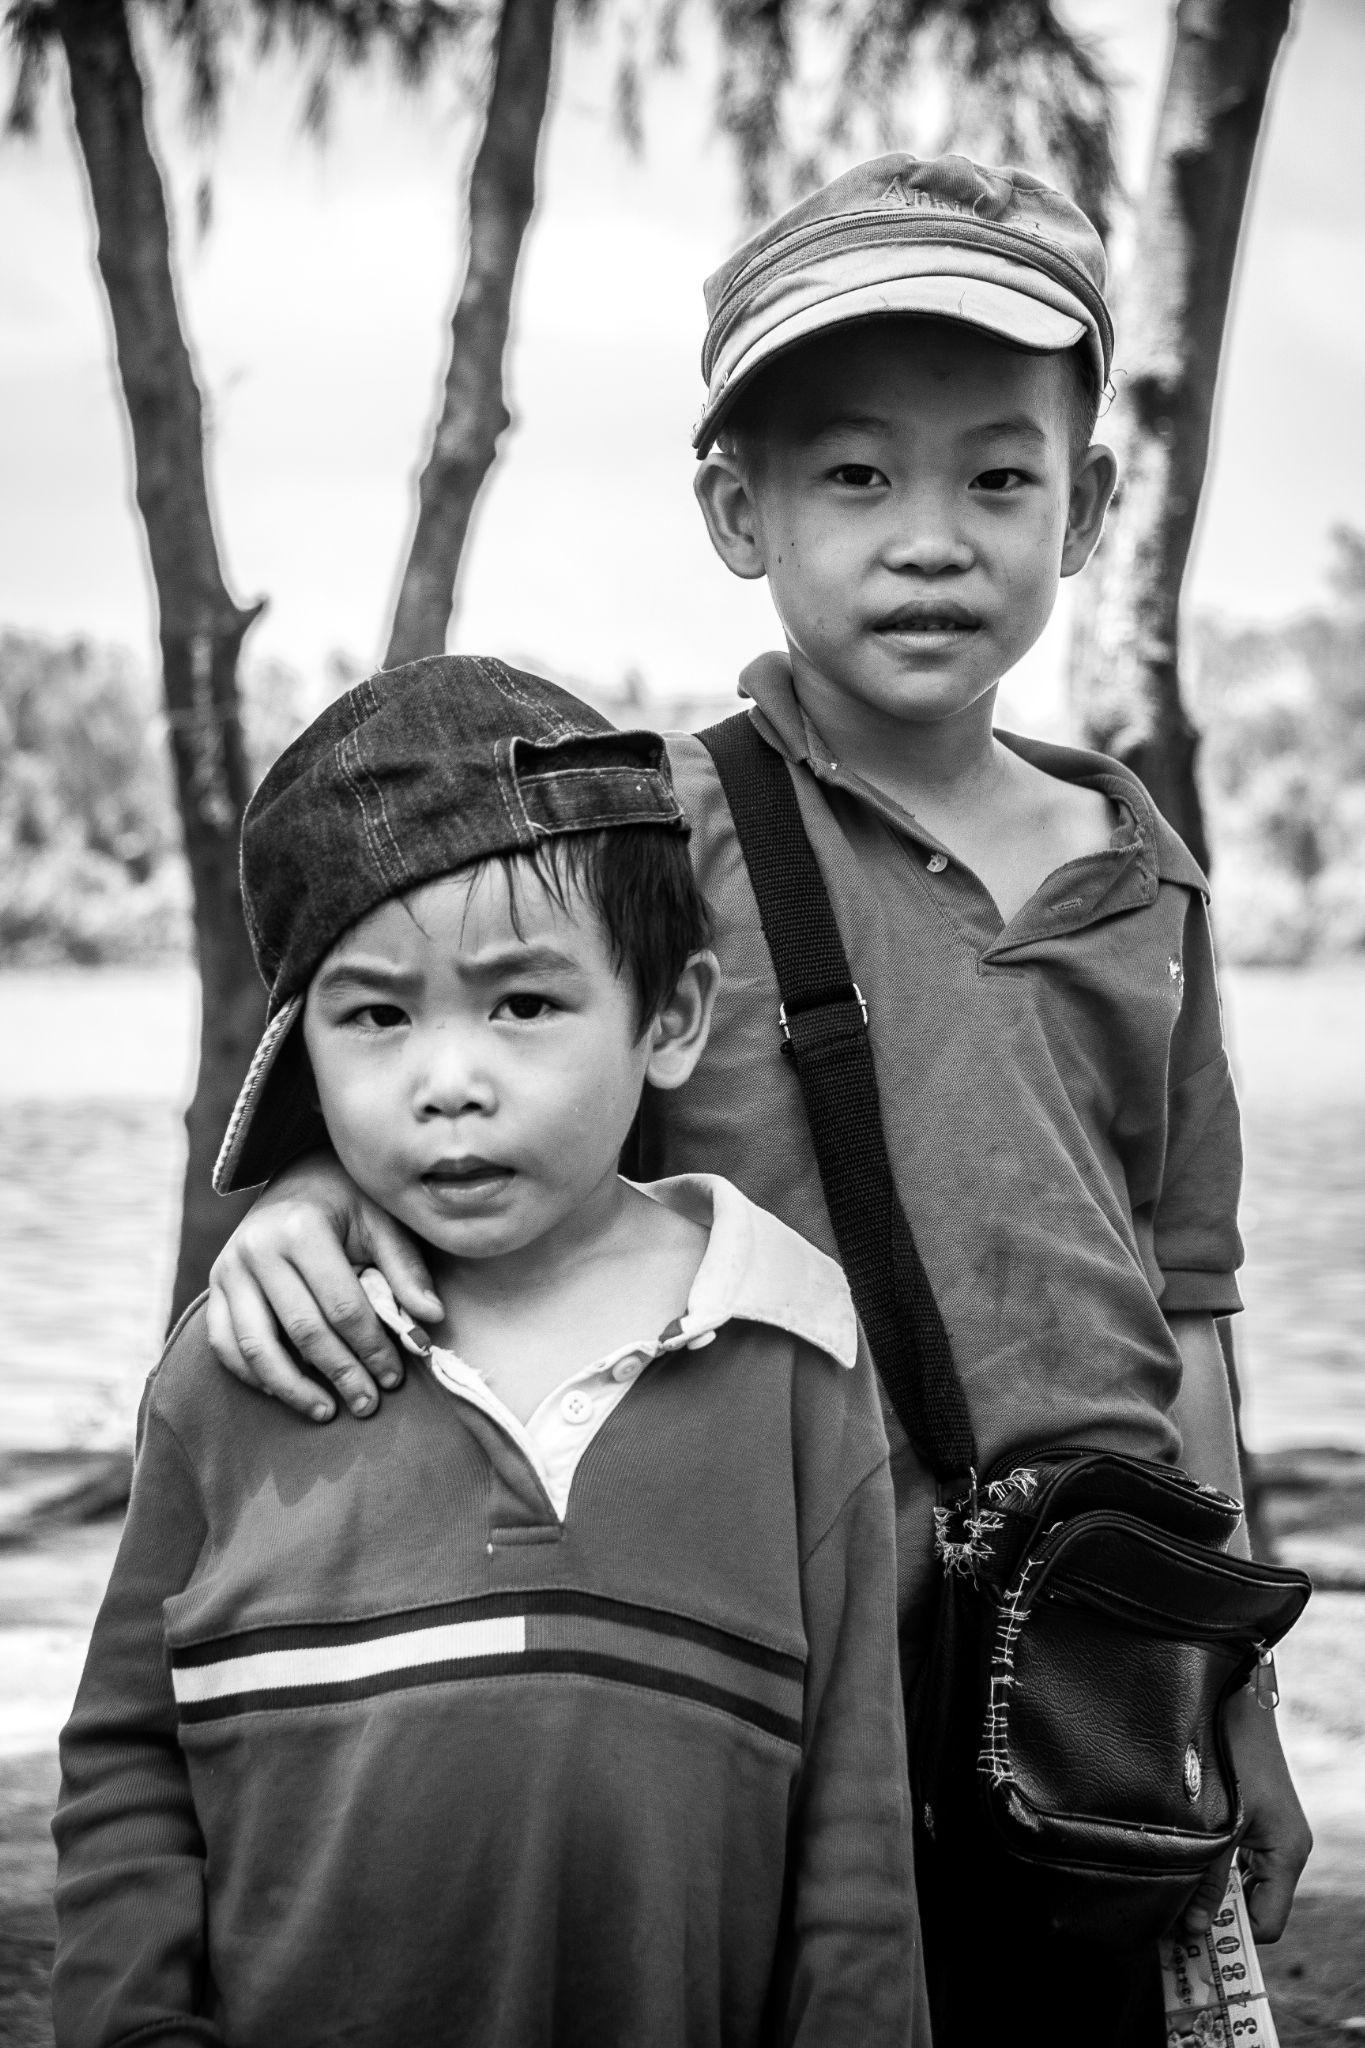 Street kid 02 by Tuấn Khanh